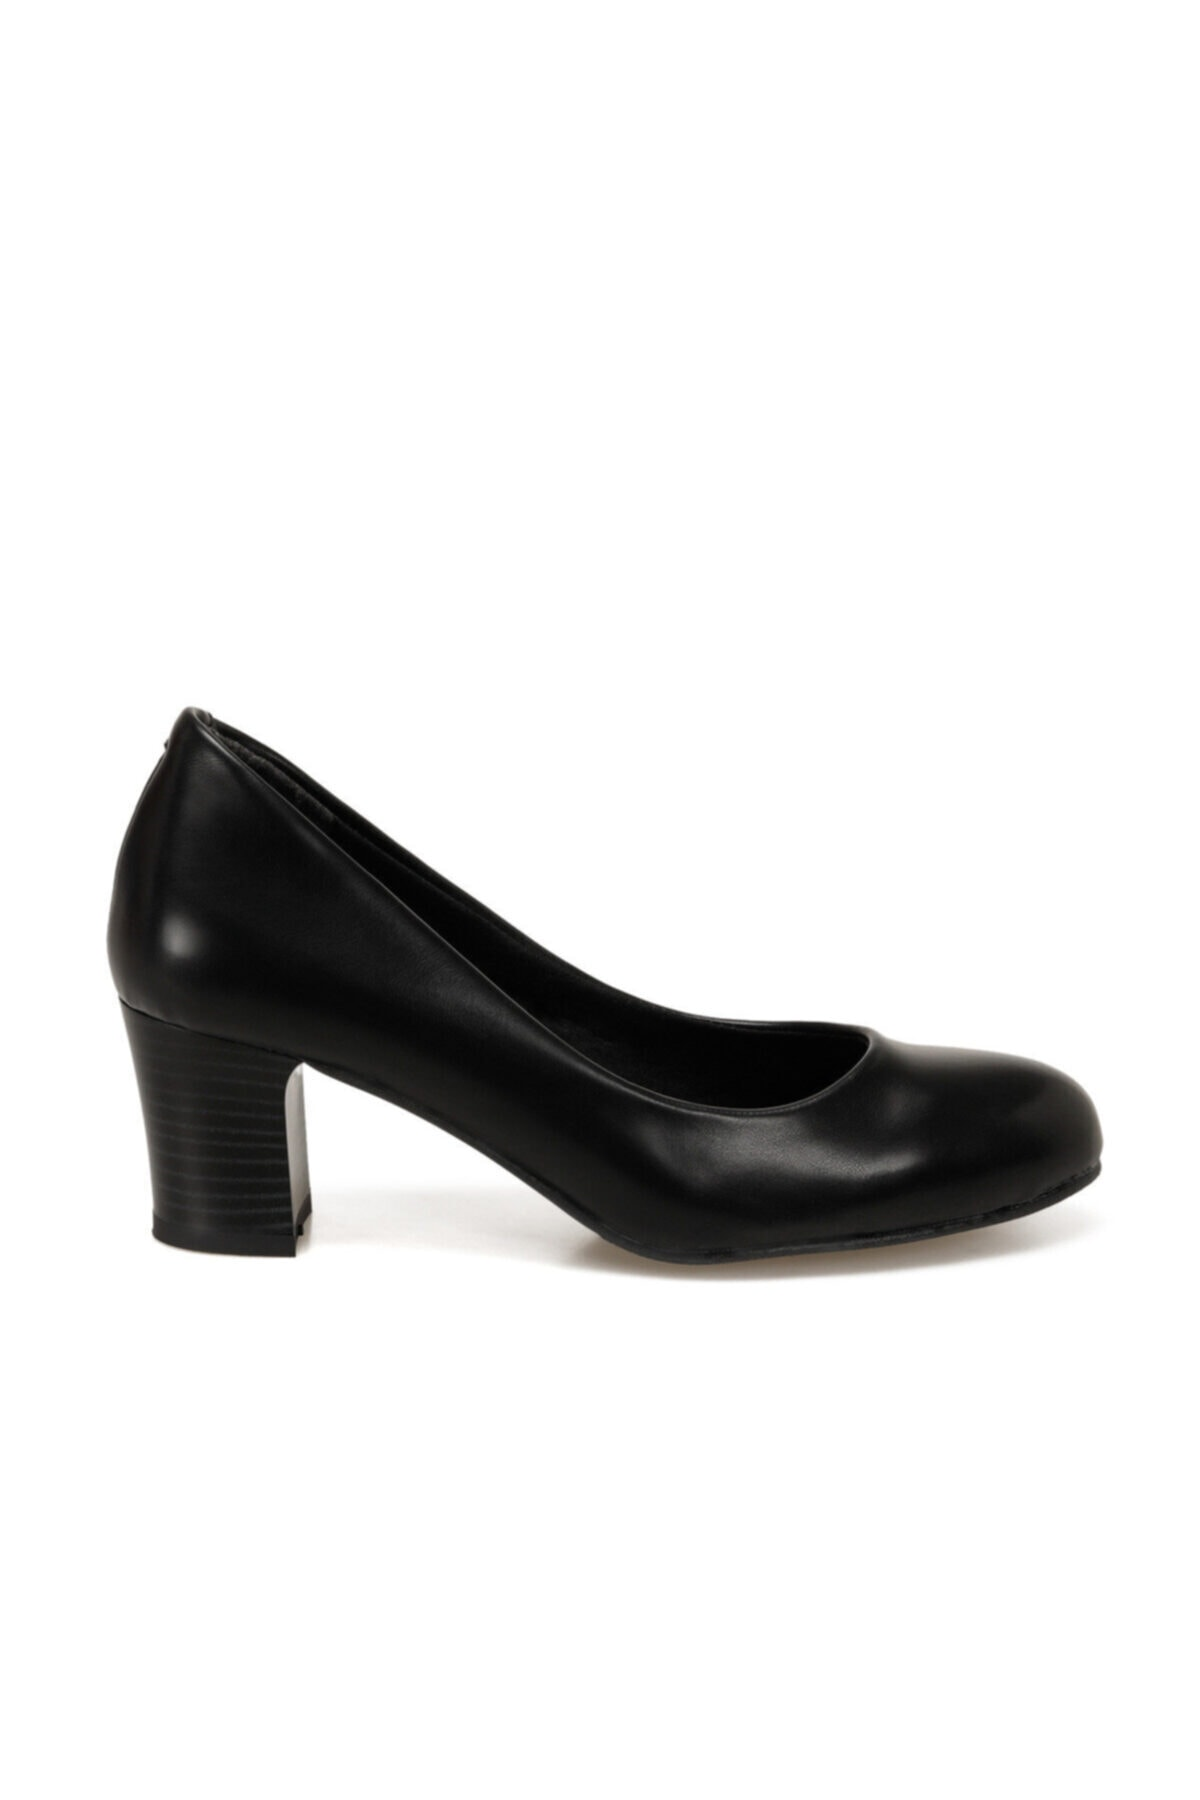 Miss F DW20028 Siyah Kadın Topuklu Ayakkabı 100572125 2